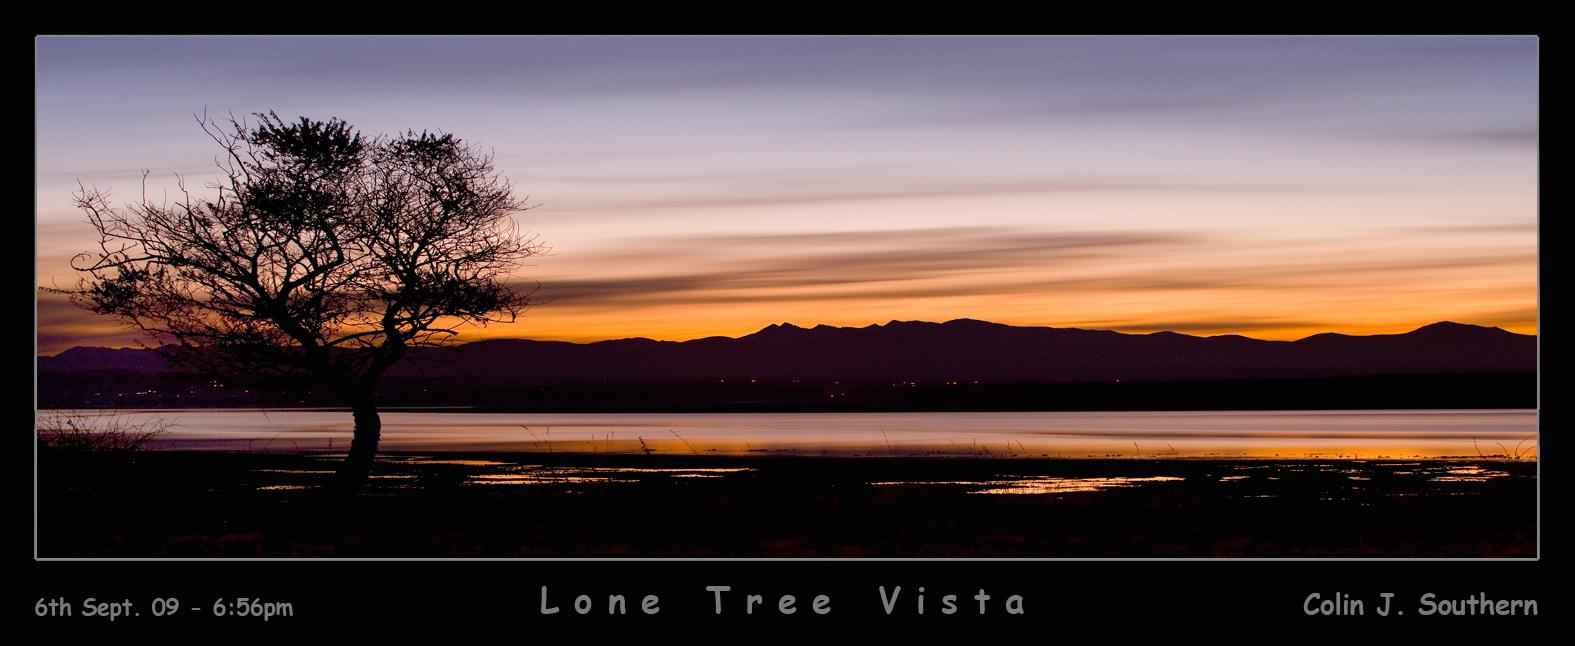 Lone Tree Vista